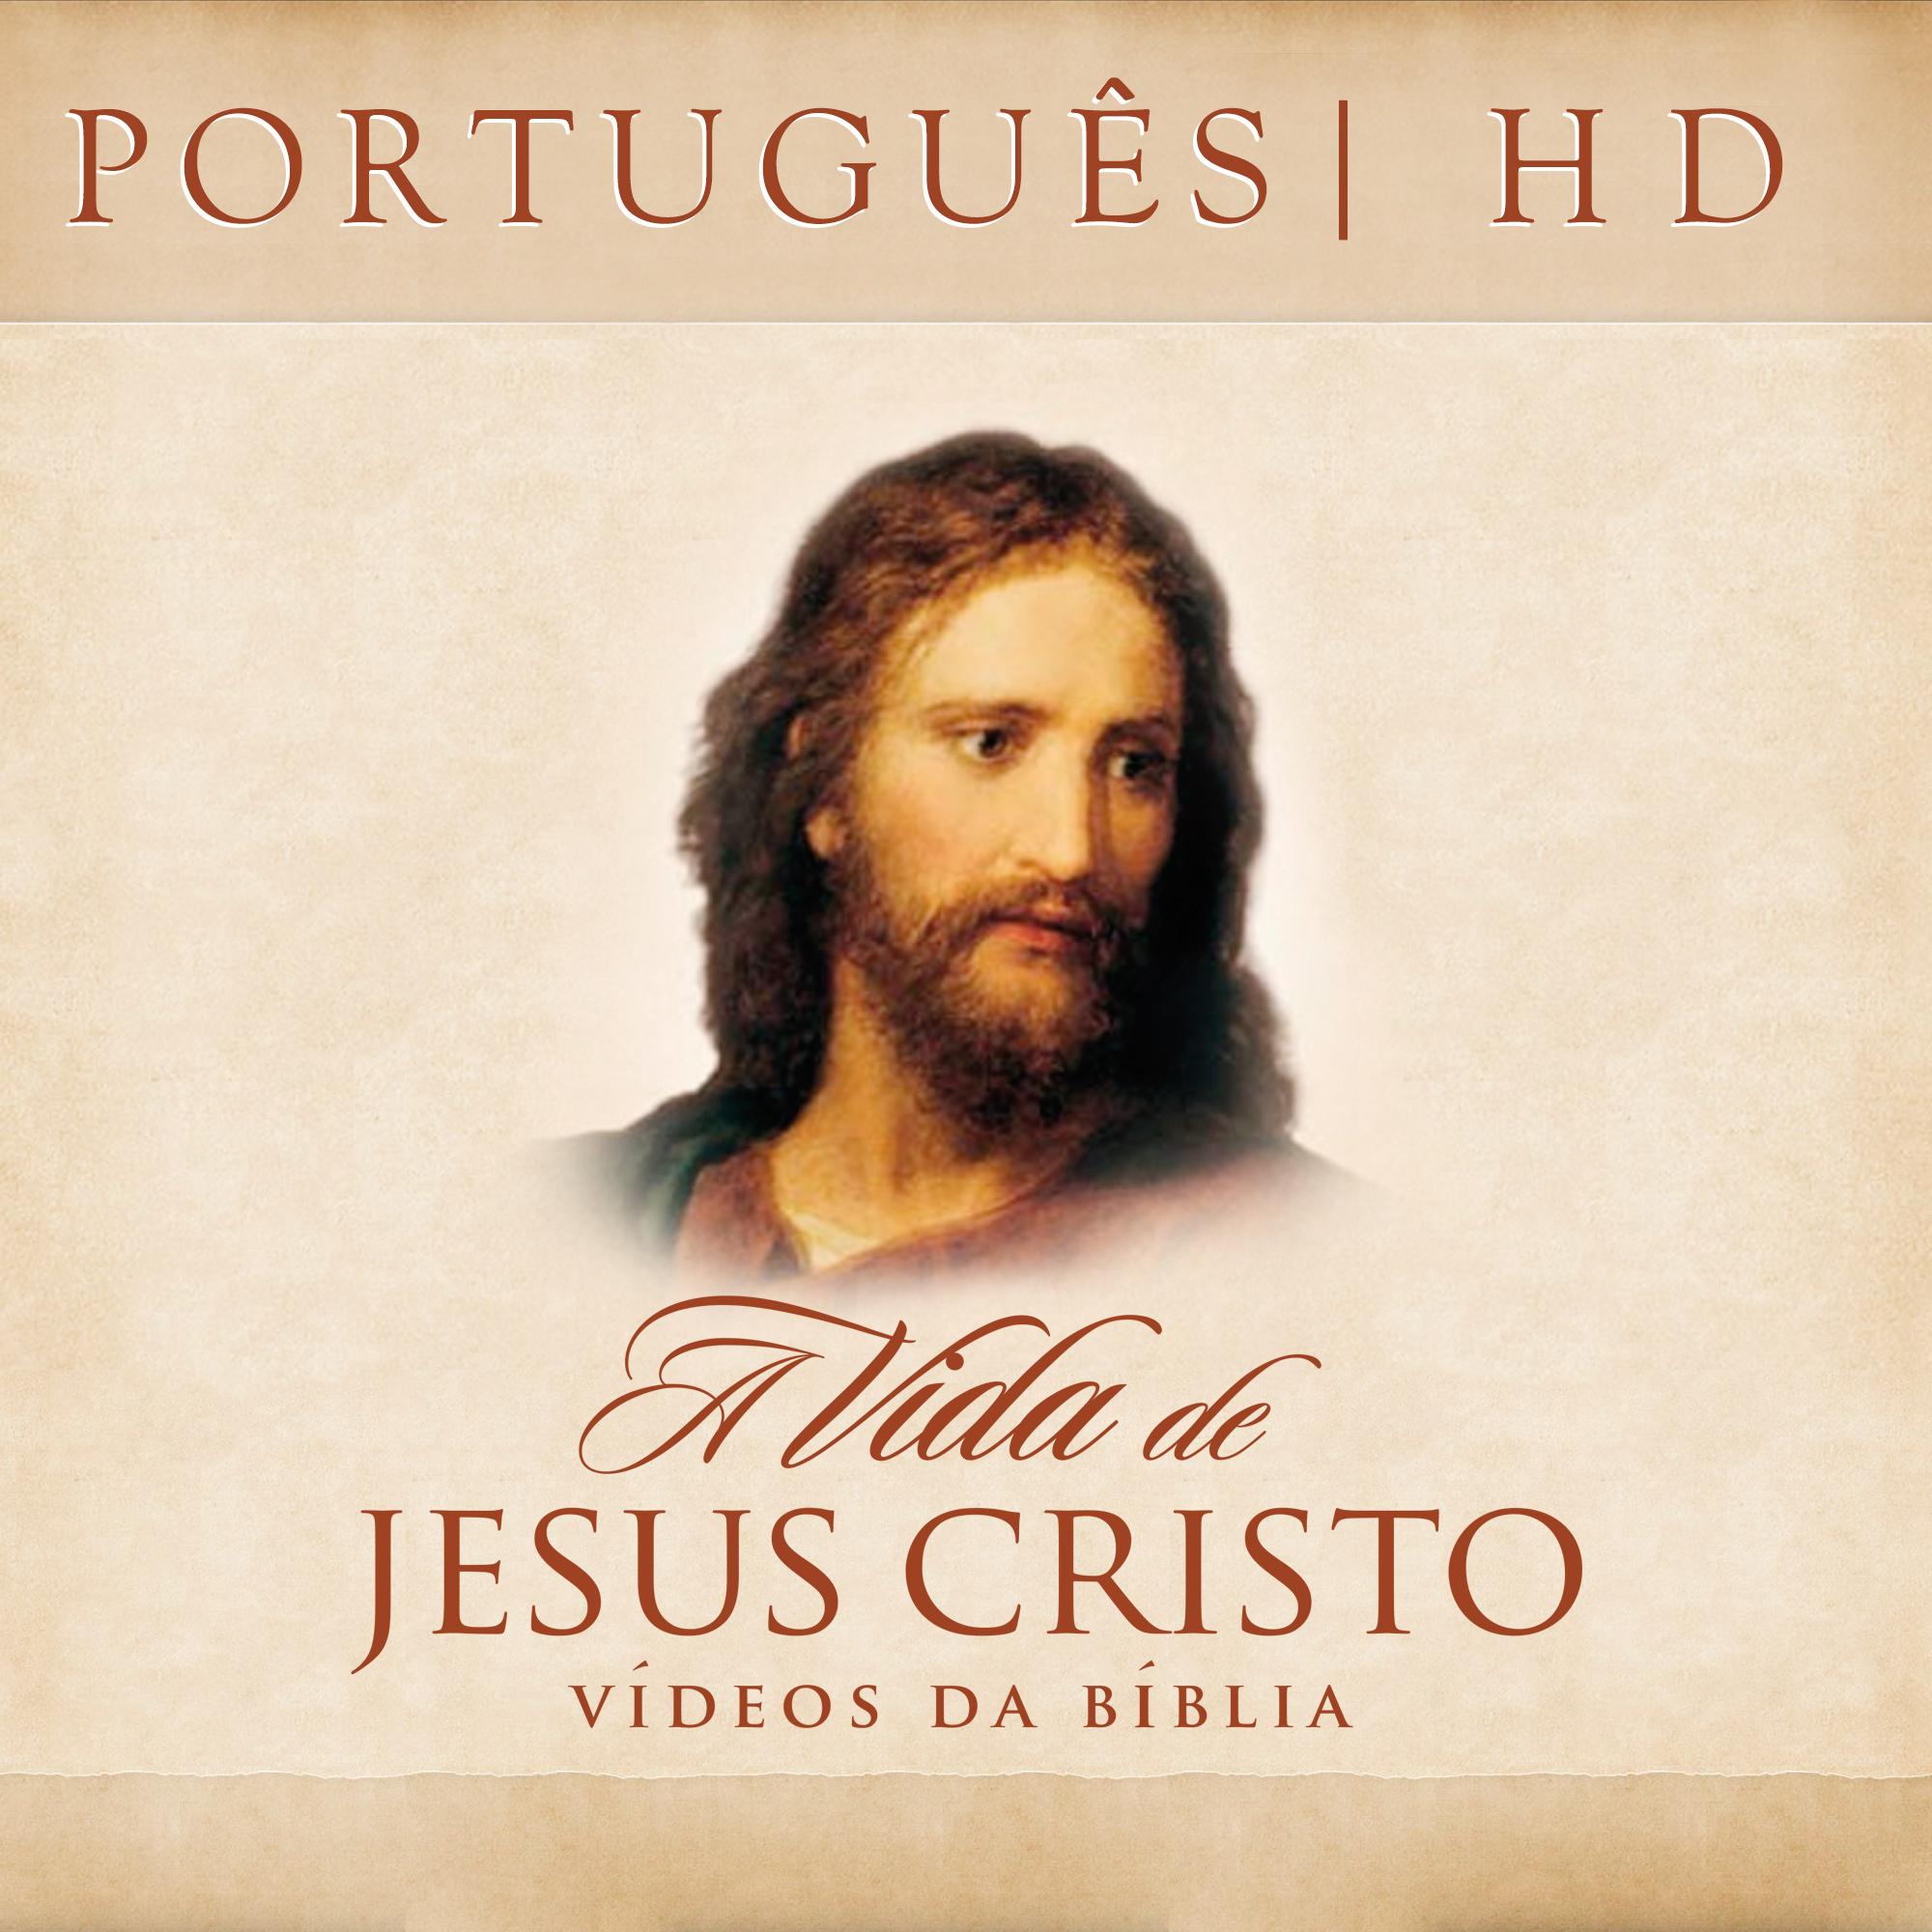 A Vida de Jesus Cristo — Vídeos da Bíblia | HD | PORTUGUESE